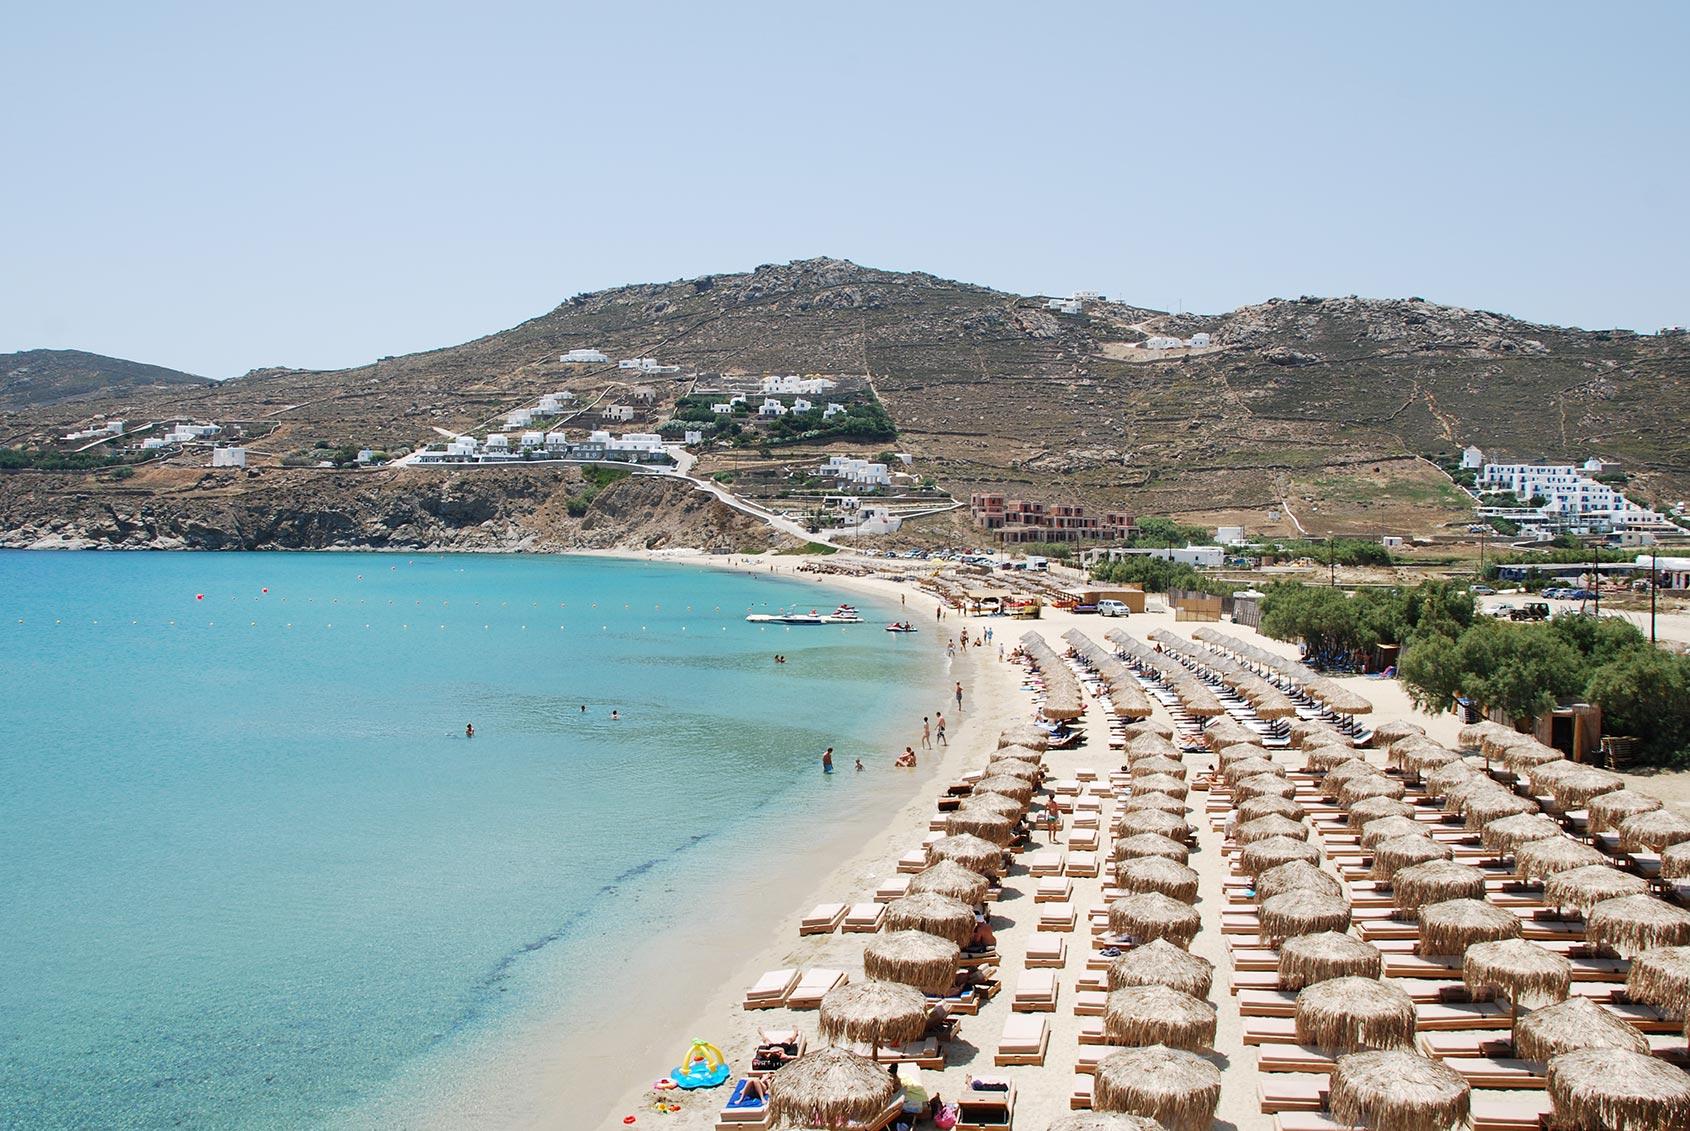 Arodou Mykonos - Kalo Livadi beach